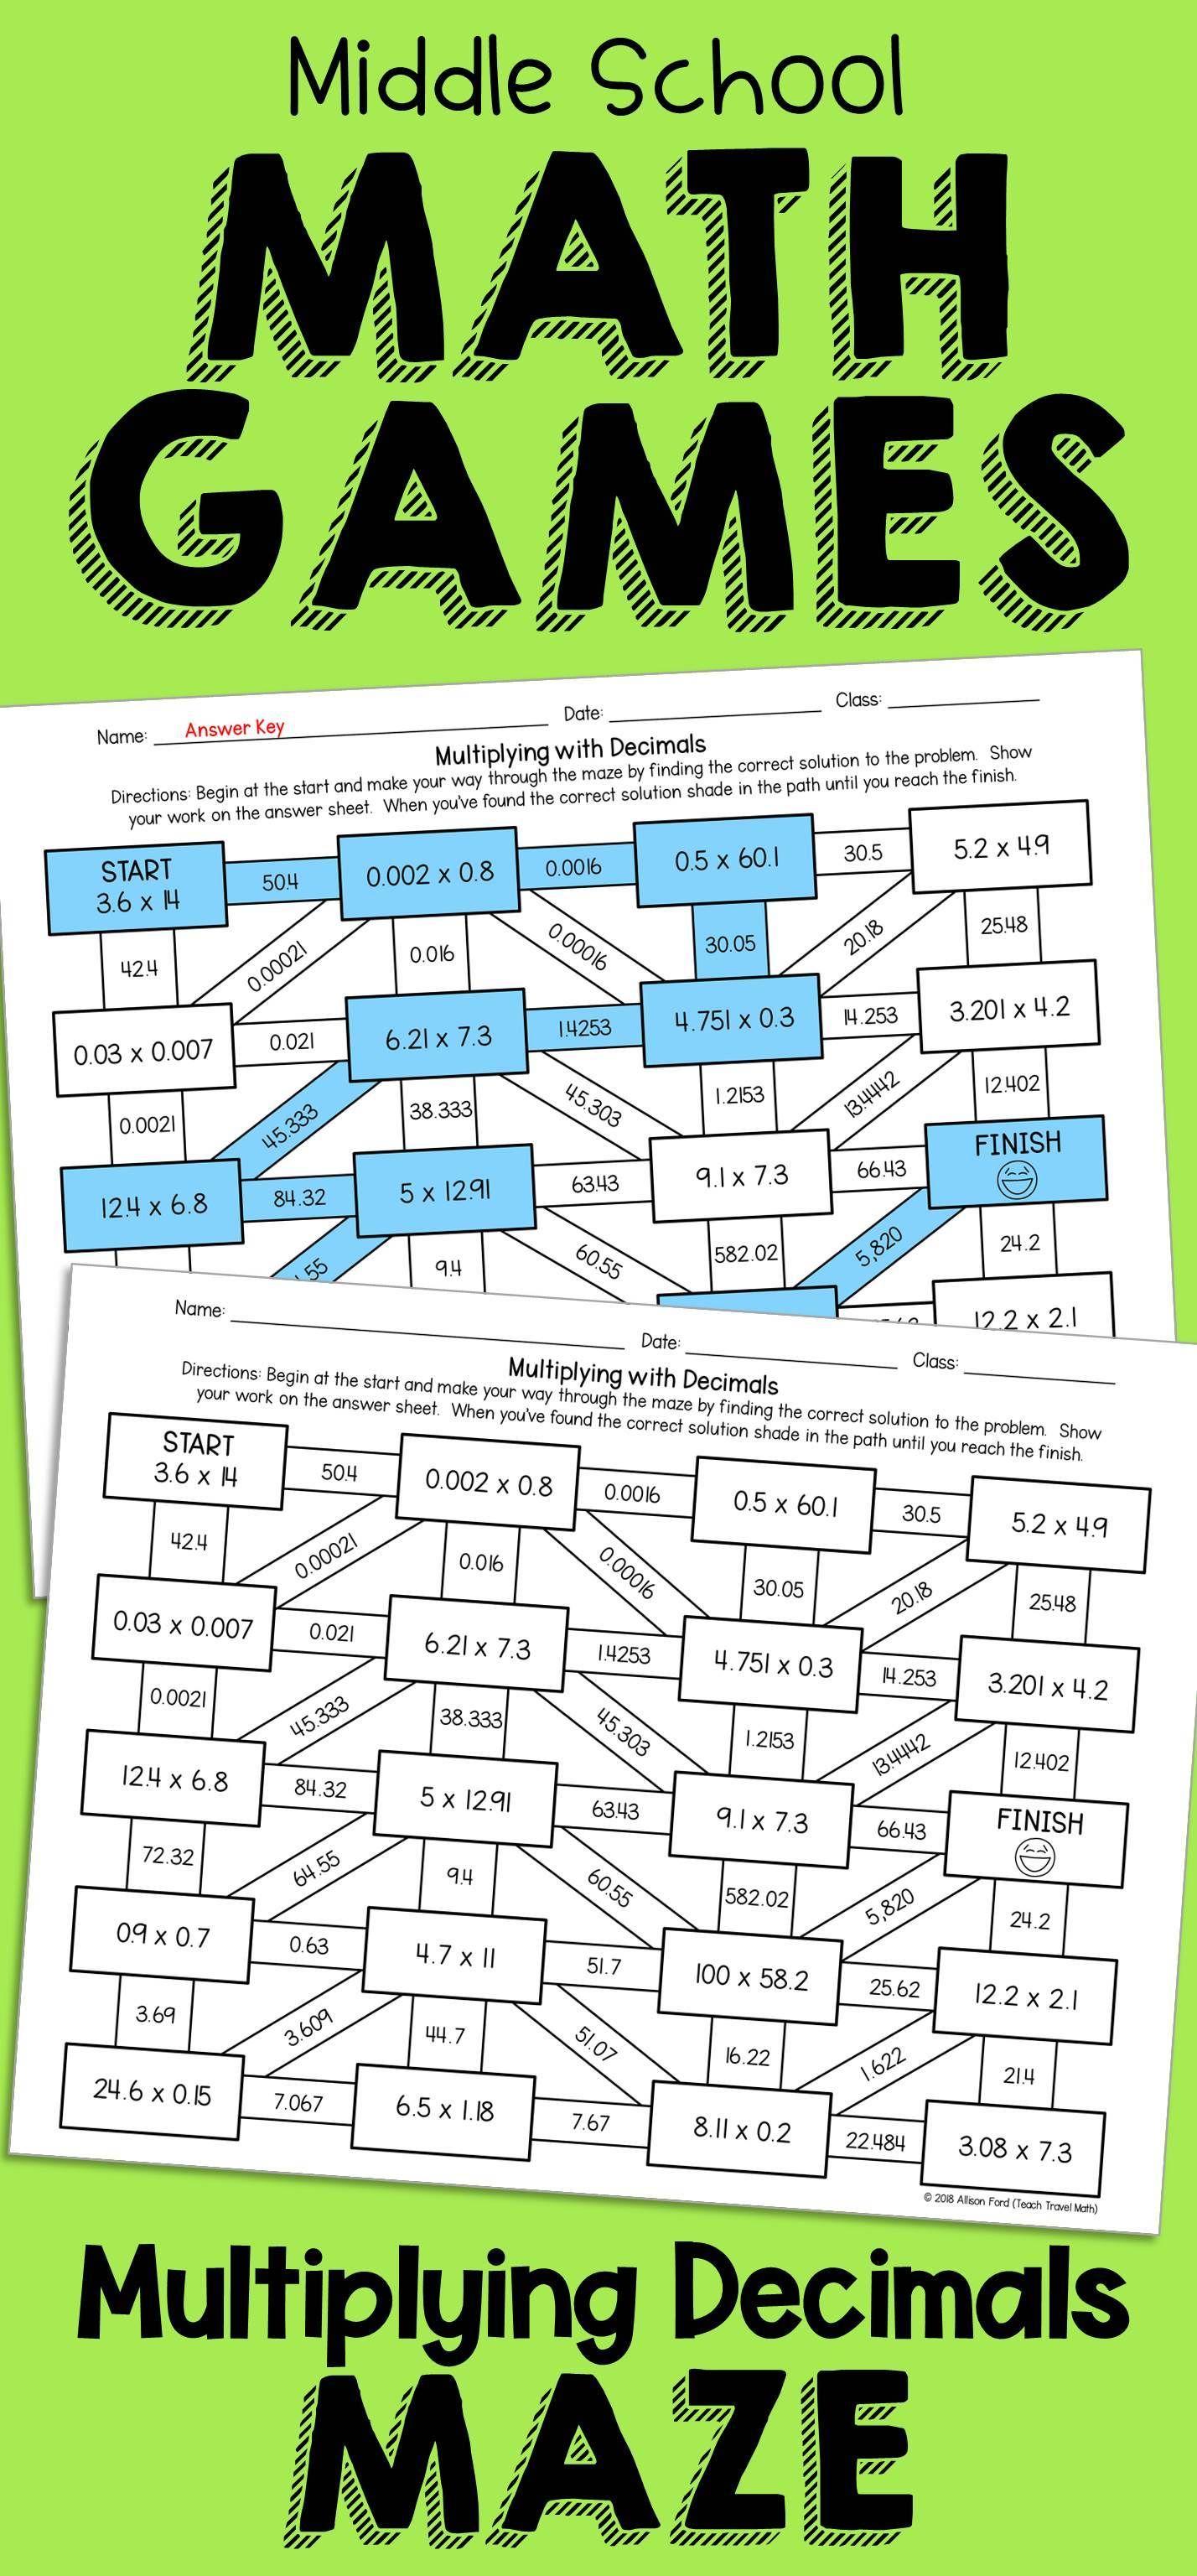 No Prep Worksheet Decimal Maze Practicing Multiplying Decimals Math Games Middle School Decimals Subtracting Decimals